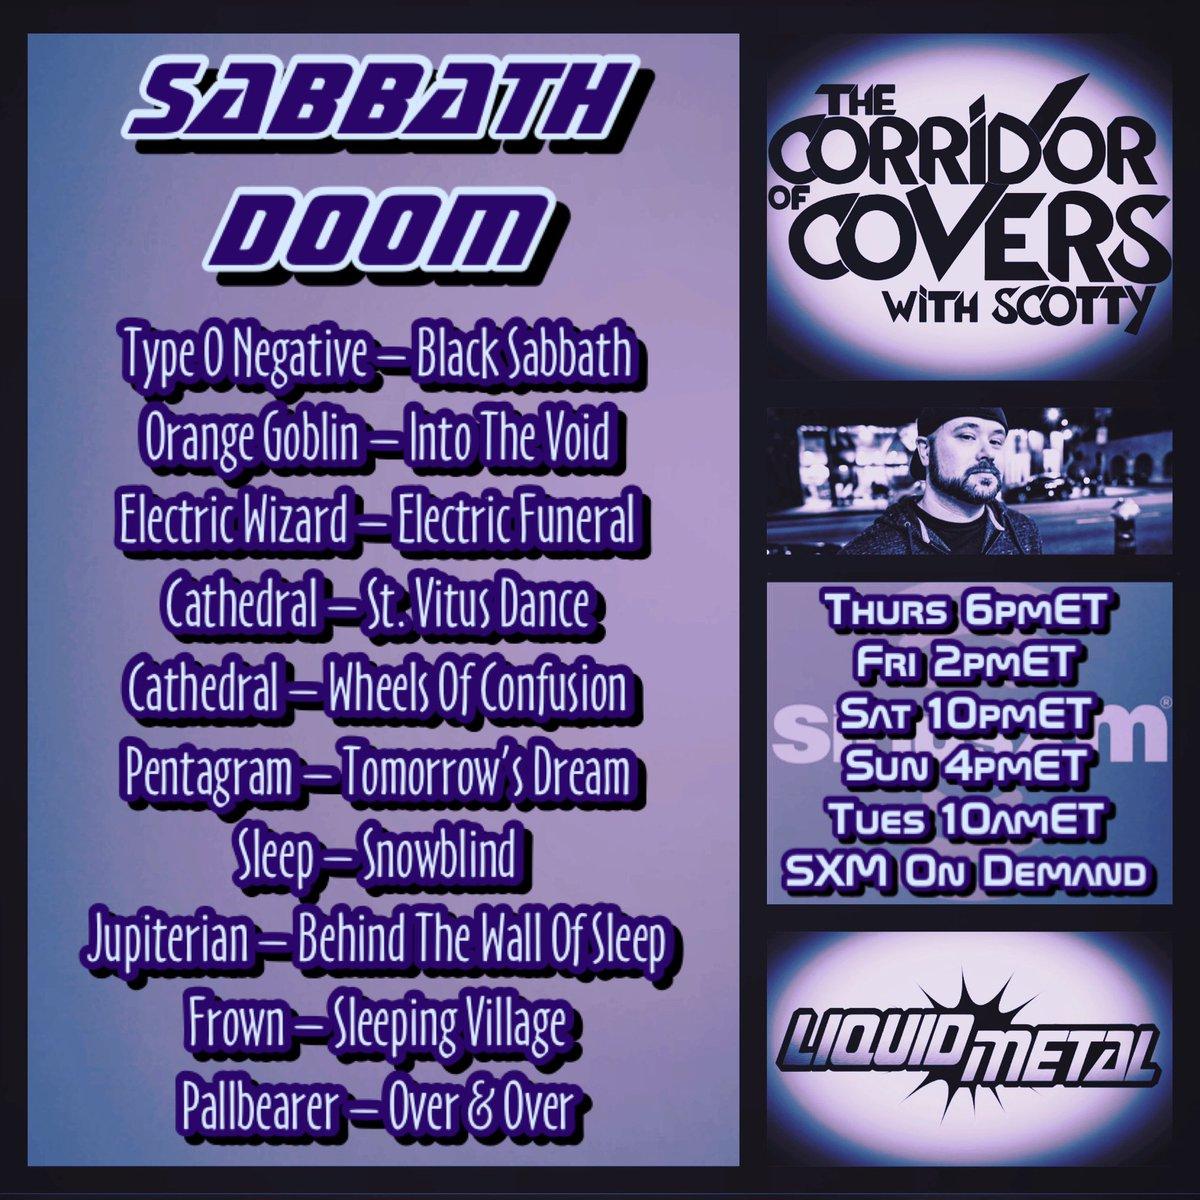 #corridorofcovers w/ #Scotty on #sxmliquidmetal .. all #blacksabbath #doommetal covers for the #undertaker last ride #metal #heavymetal #metalcovers #coversong #siriusxm #cathedralband #pentagramband #doom #sleeppic.twitter.com/AAc9Lii425